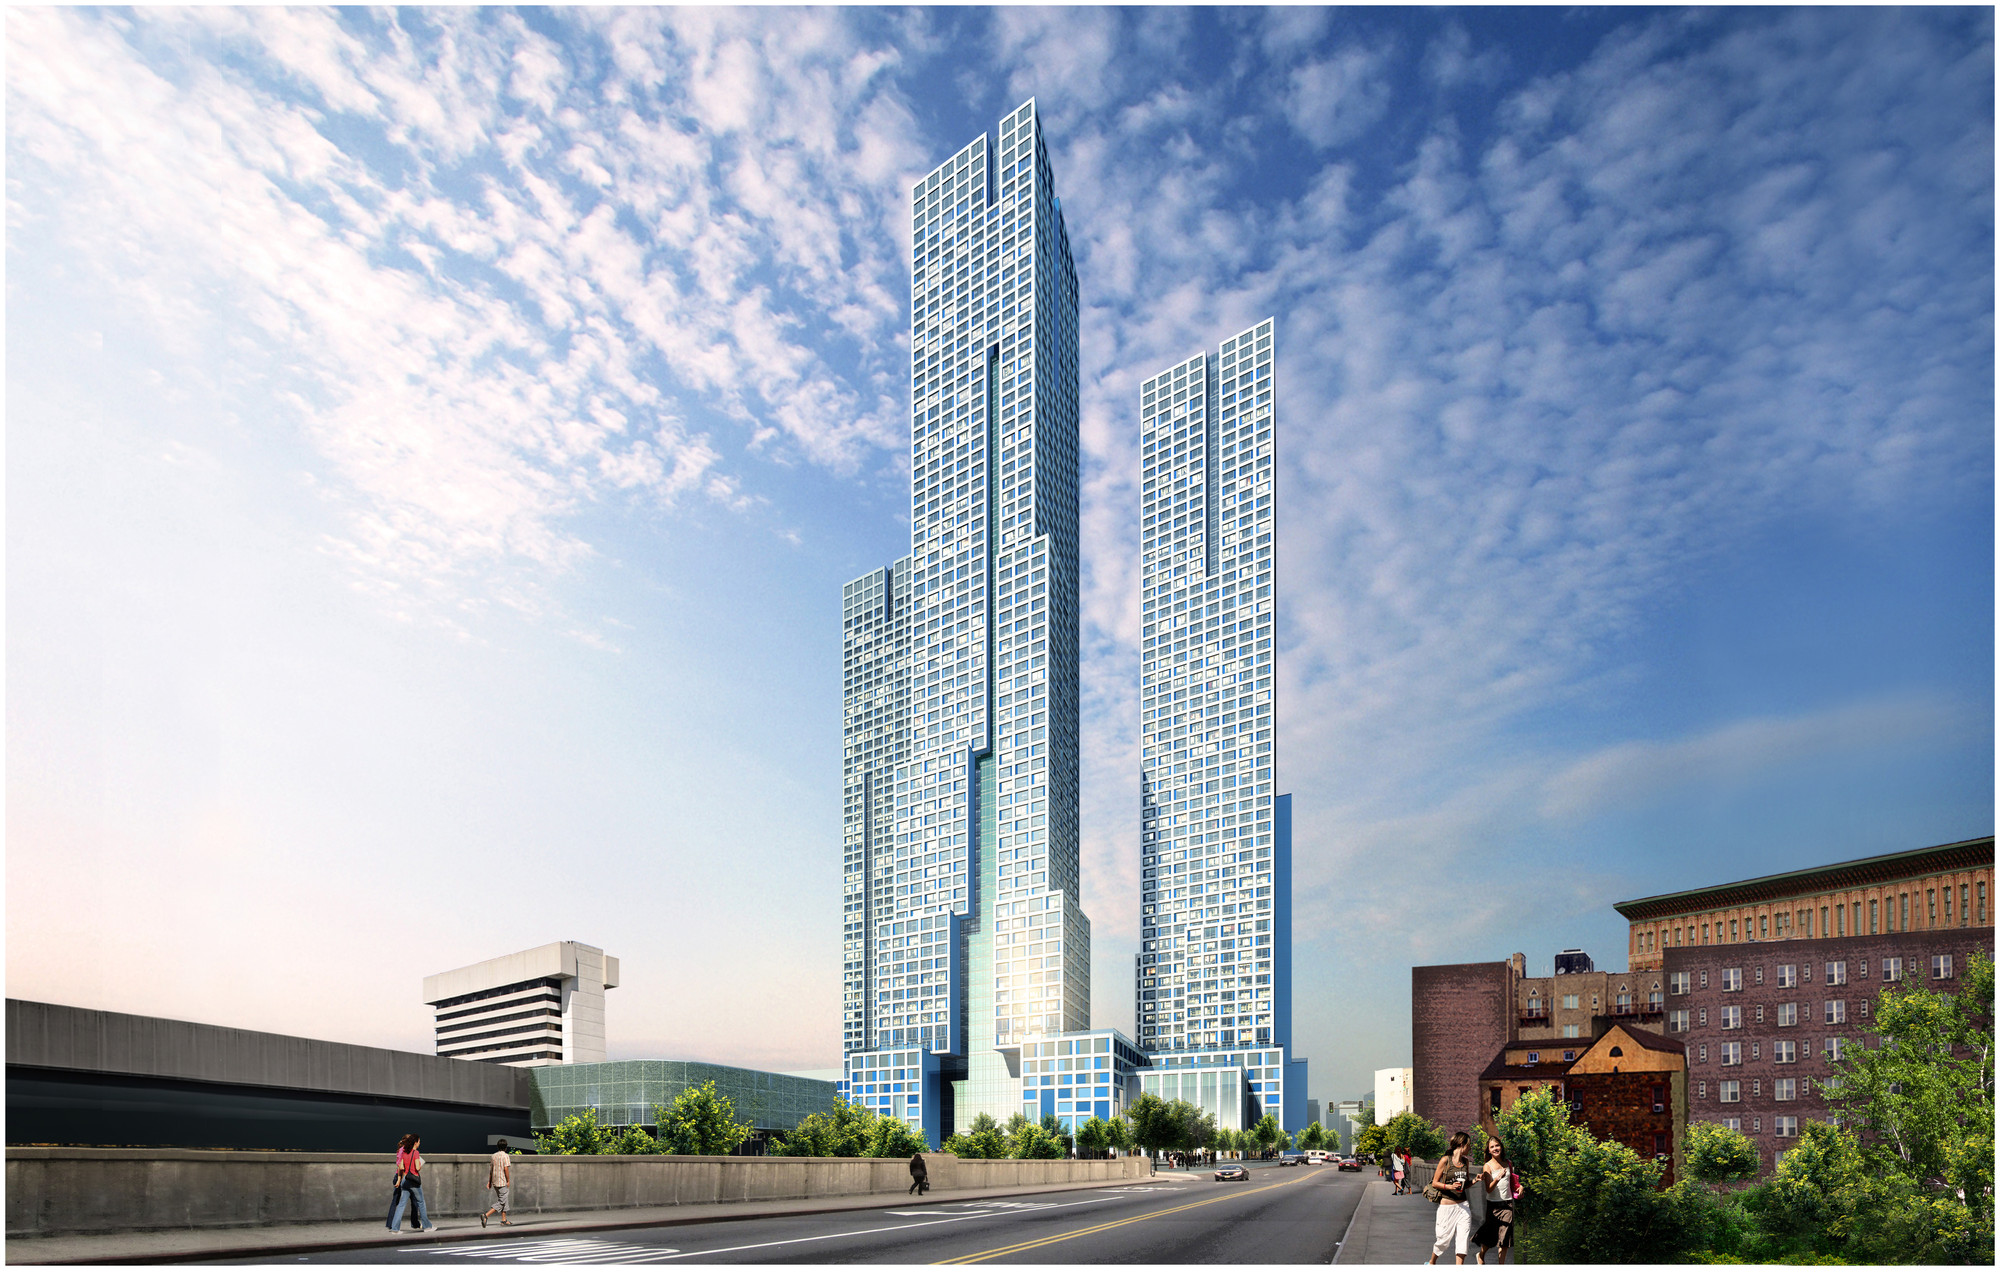 HWKN + Handel Architects Break Ground on New Jersey's Tallest Building, © Hollwich Kushner (HWKN) + Handel Architects